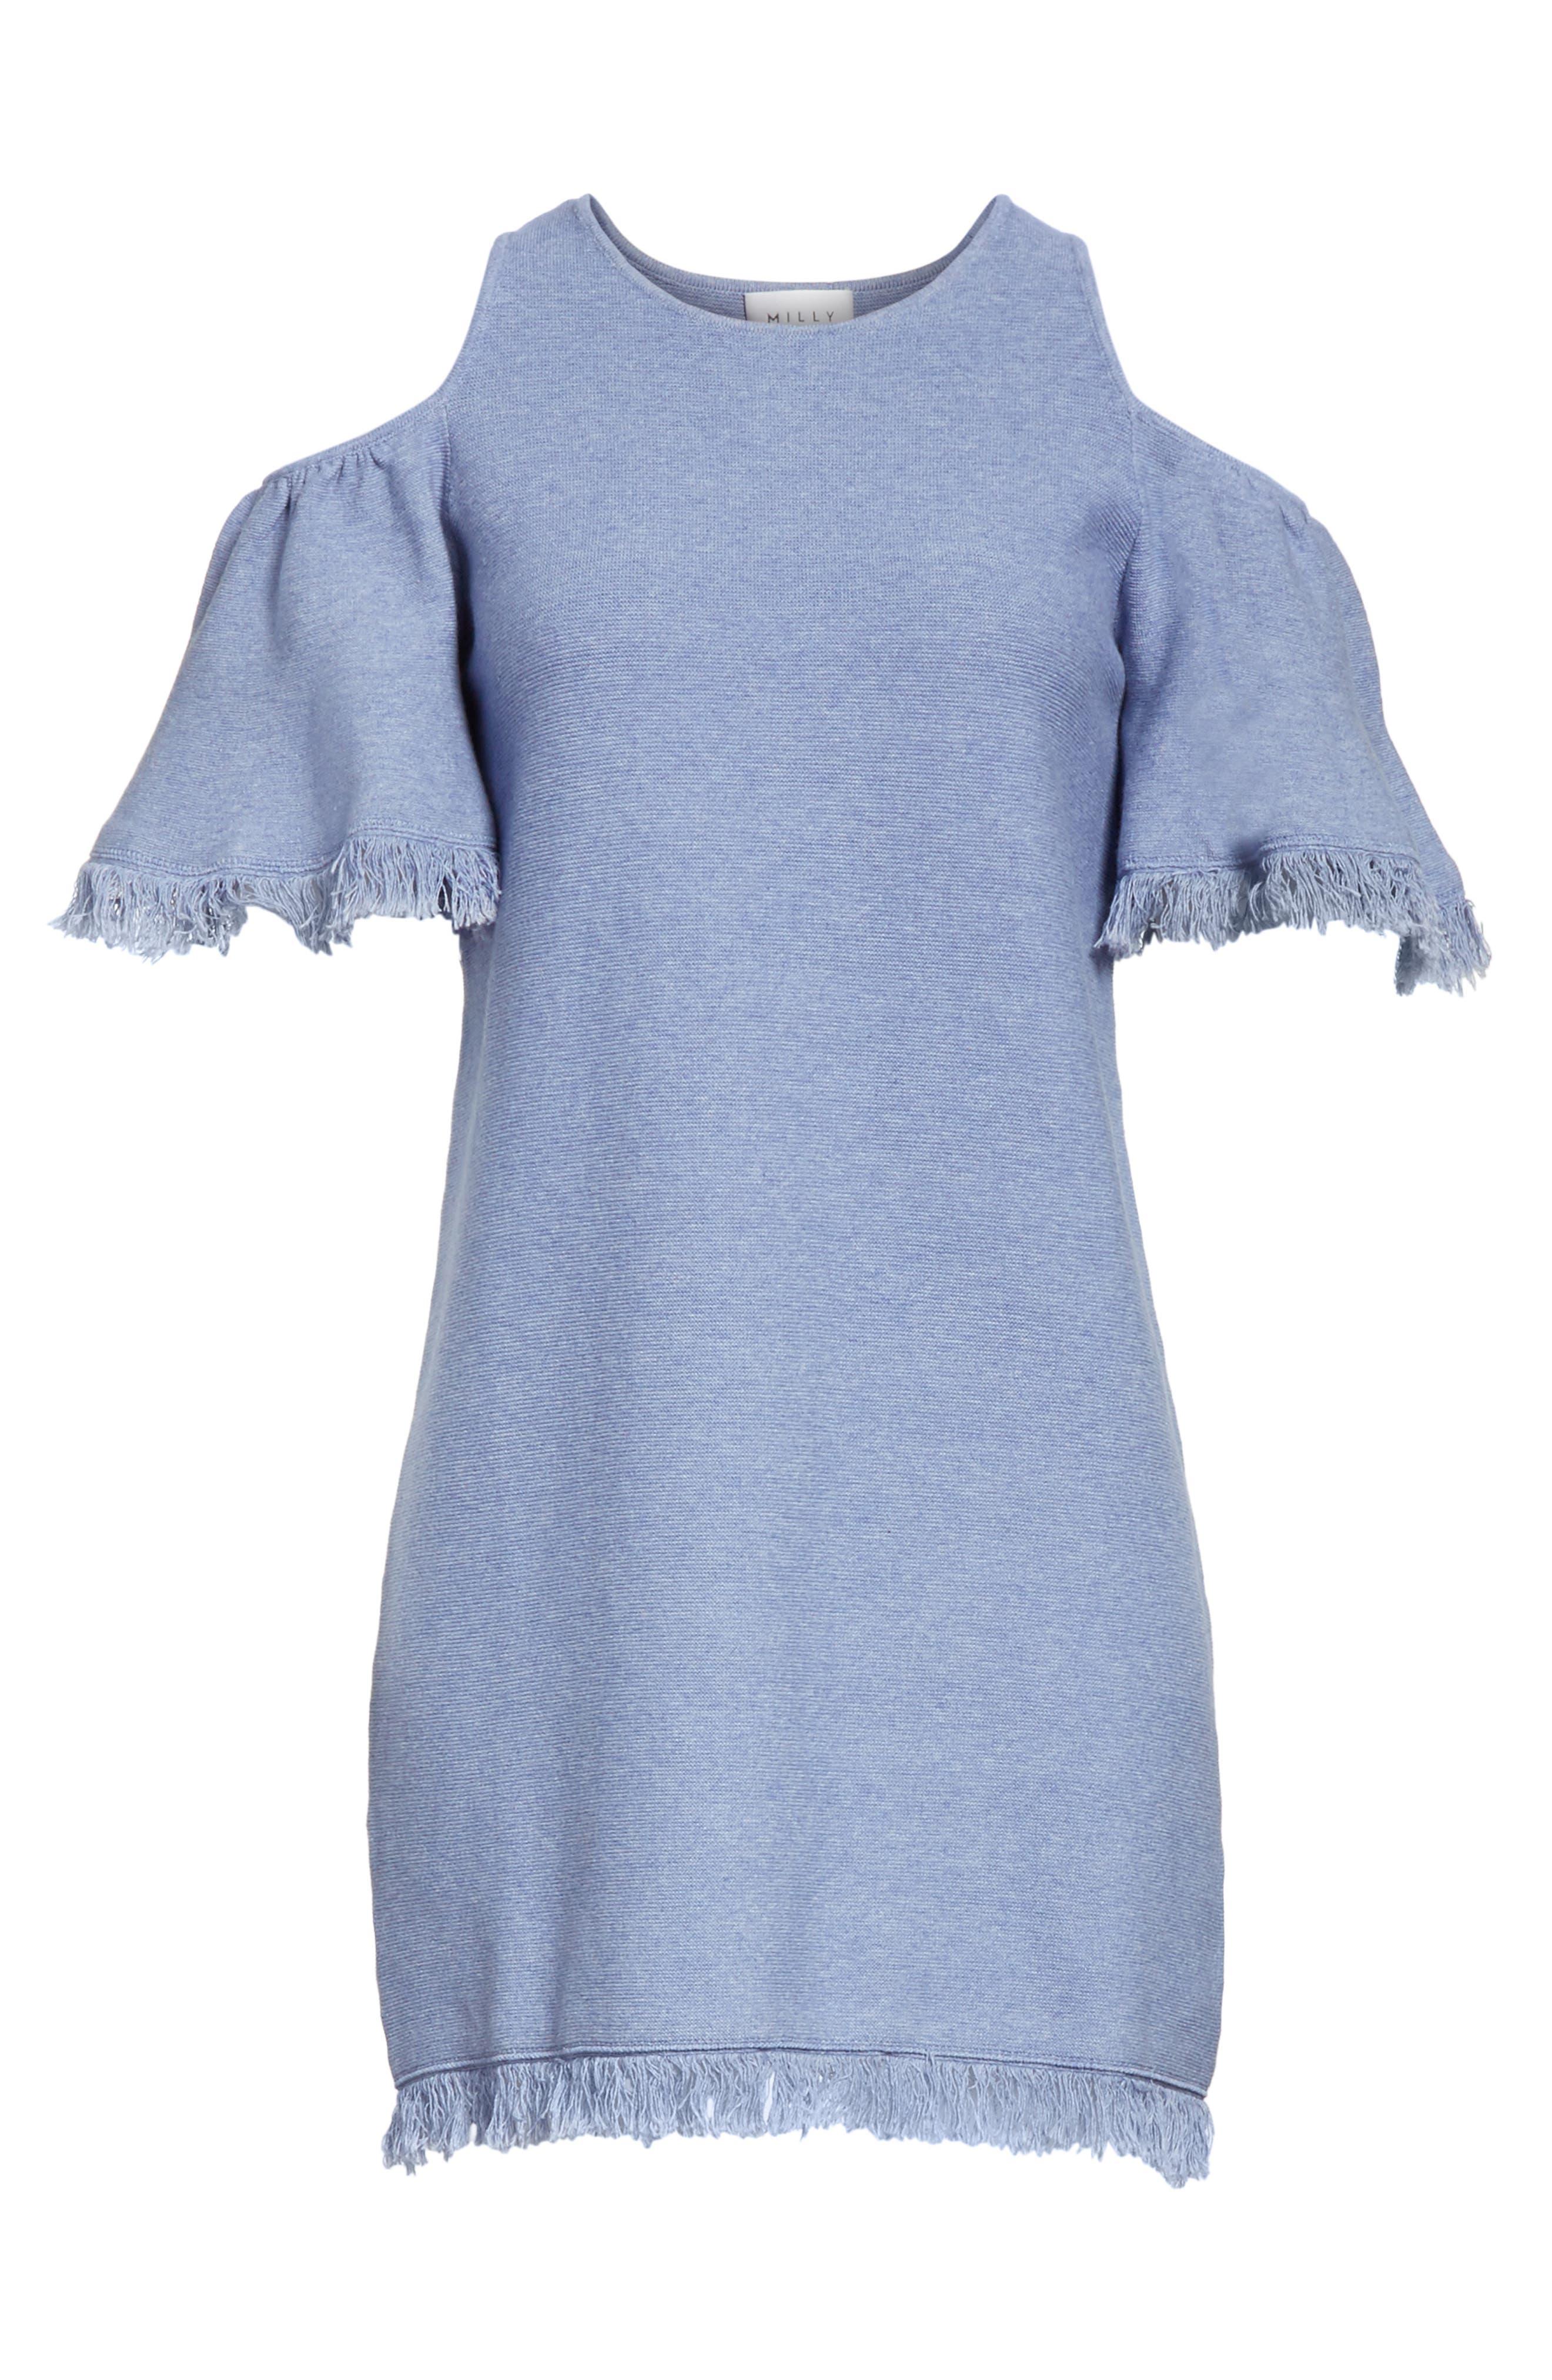 Denim Knit Fringe Cold Shoulder Minidress,                             Alternate thumbnail 6, color,                             Chambray